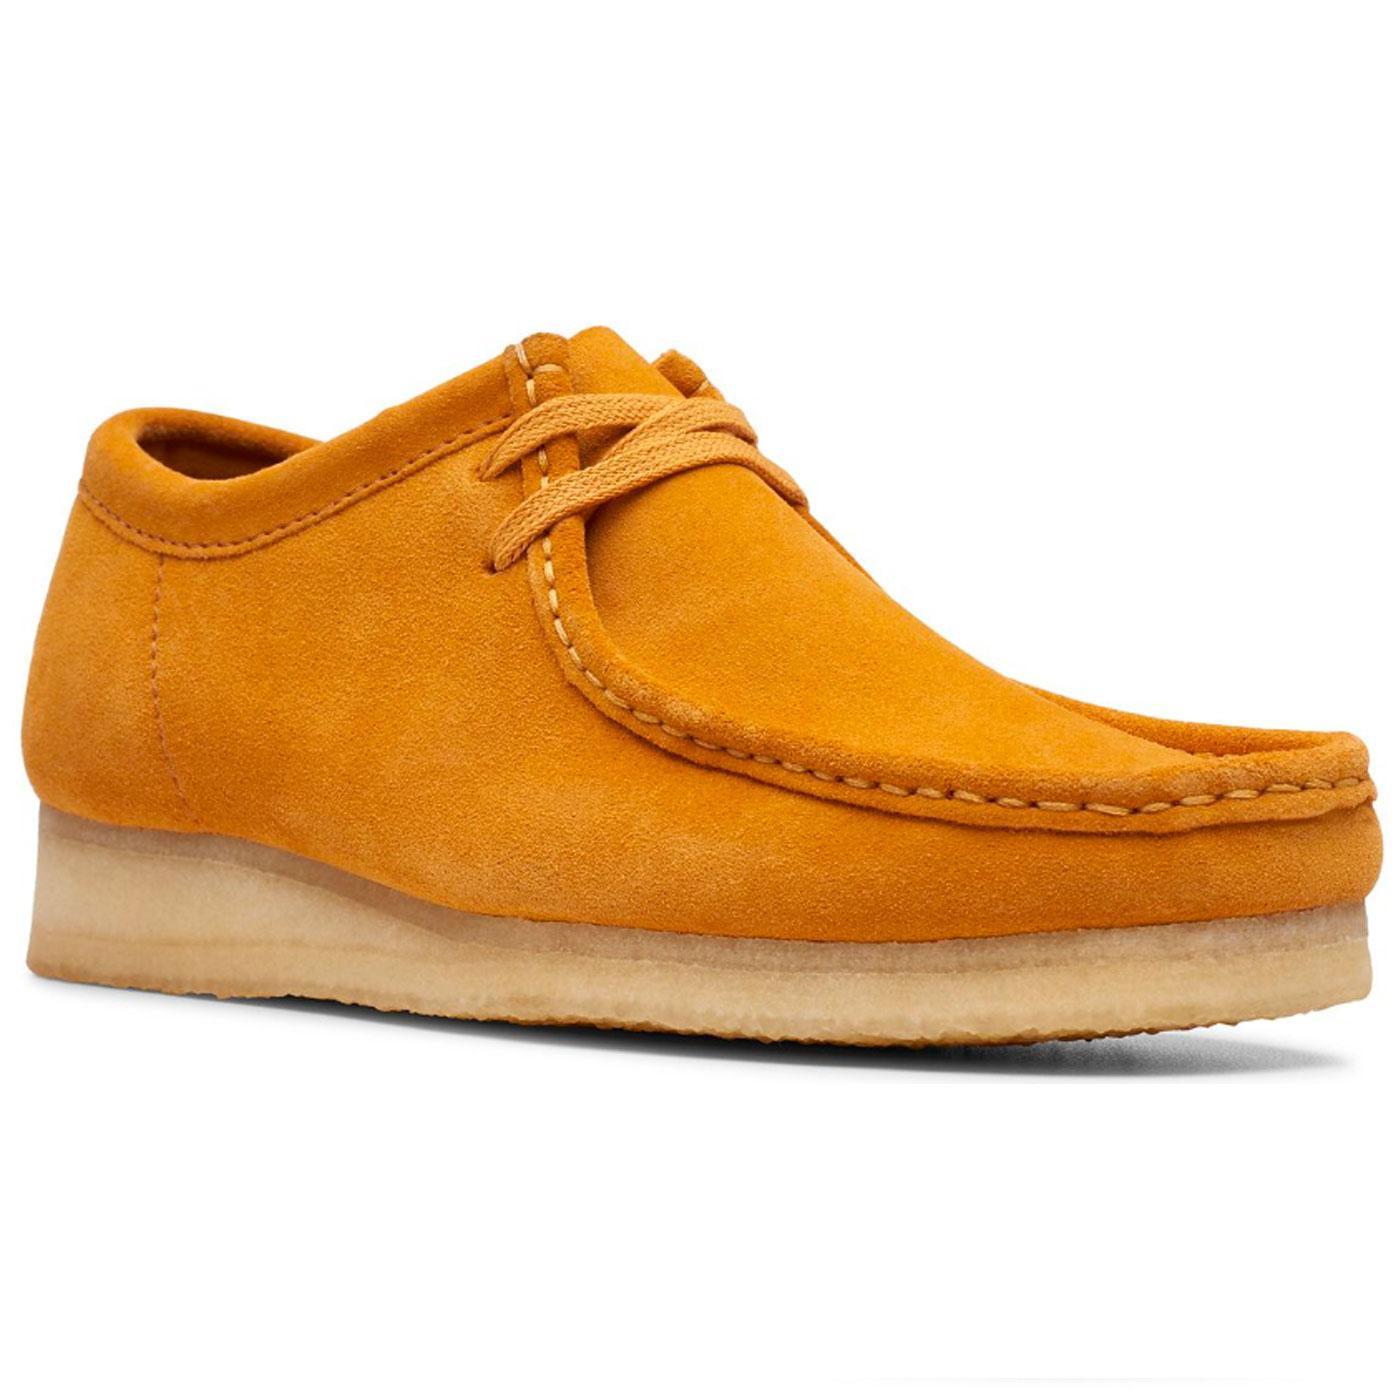 Wallabee CLARKS ORIGINALS Mod Suede Shoes TURMERIC